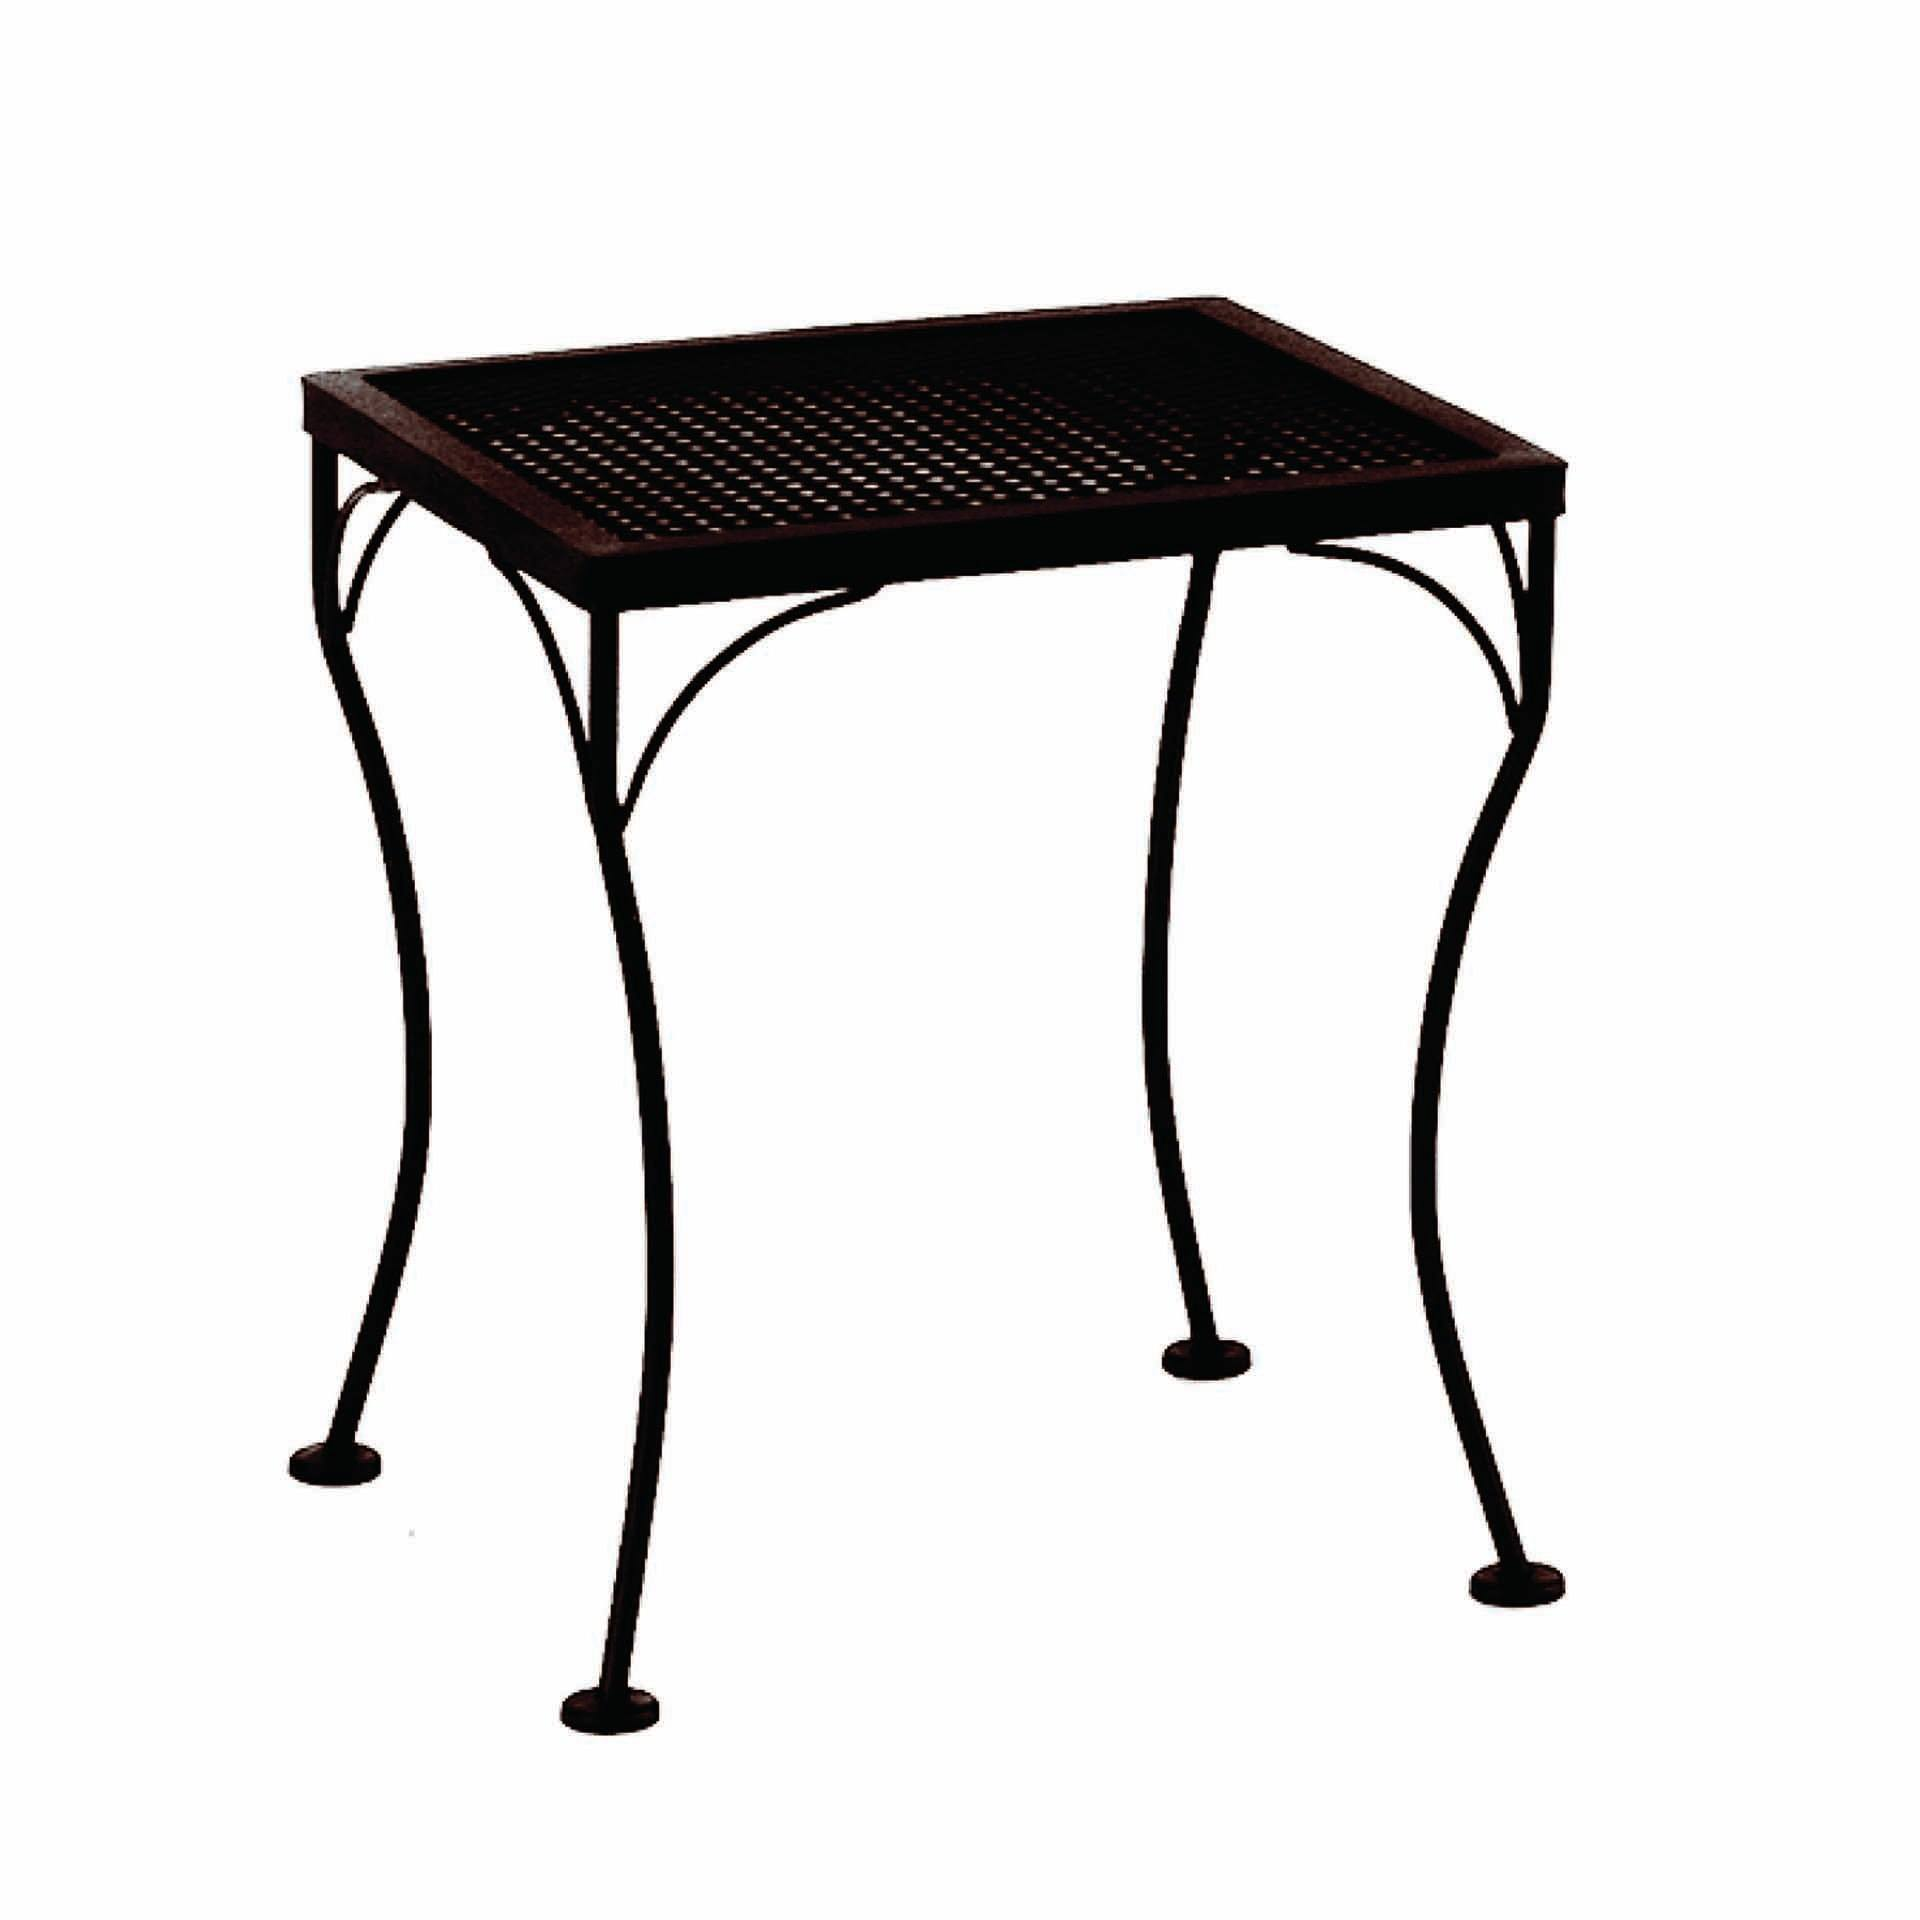 Ow Lee 18x16 Rectangular Micro Mesh Side Table Leisure